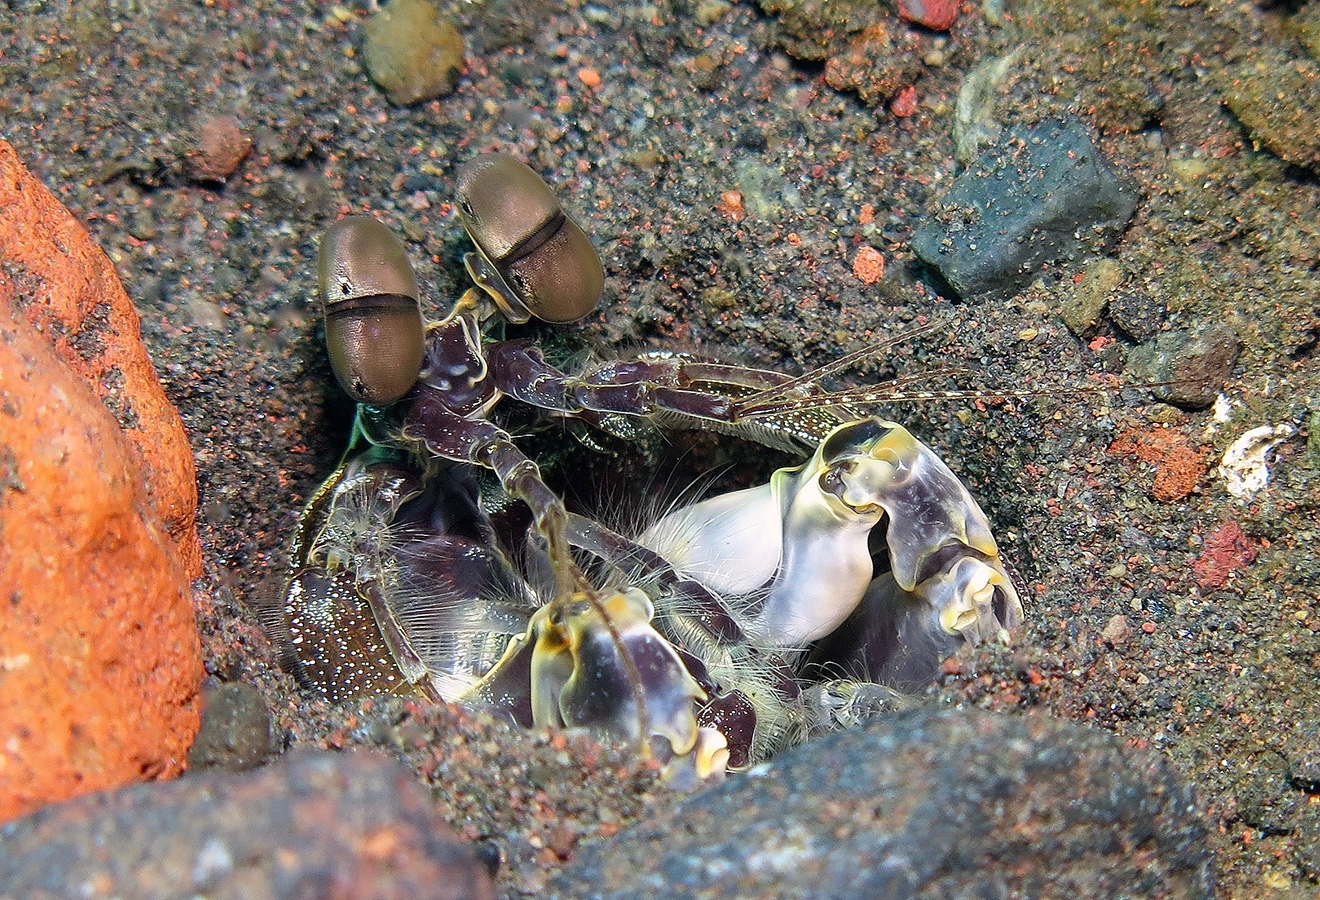 Lysiosquillina maculata     巴厘岛图蓝本 Tulamben 印度尼西亚 Indonesia @lazydiving.com 潜水时光